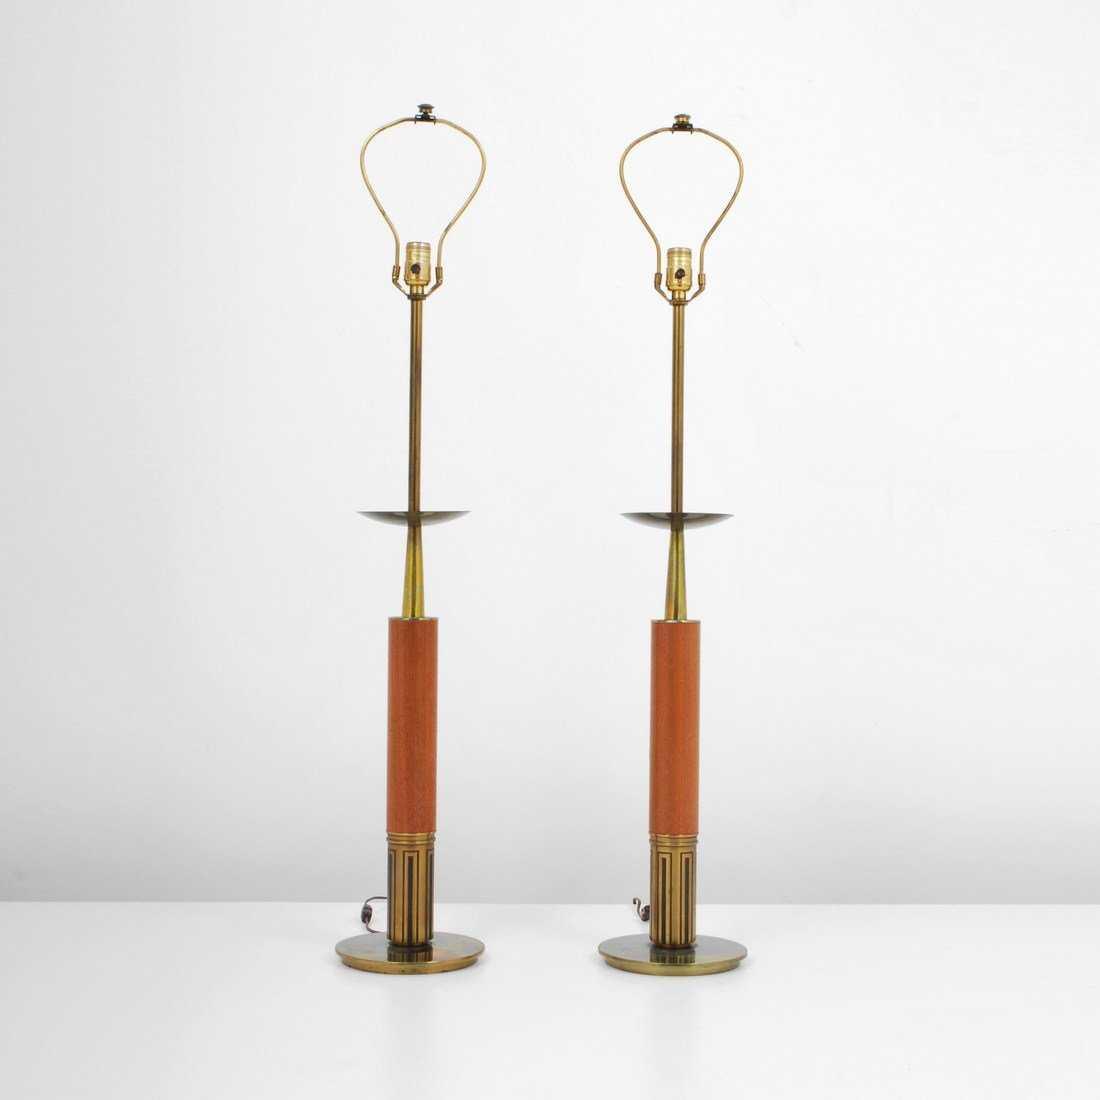 Pair of stiffel lamps tommi parzinger